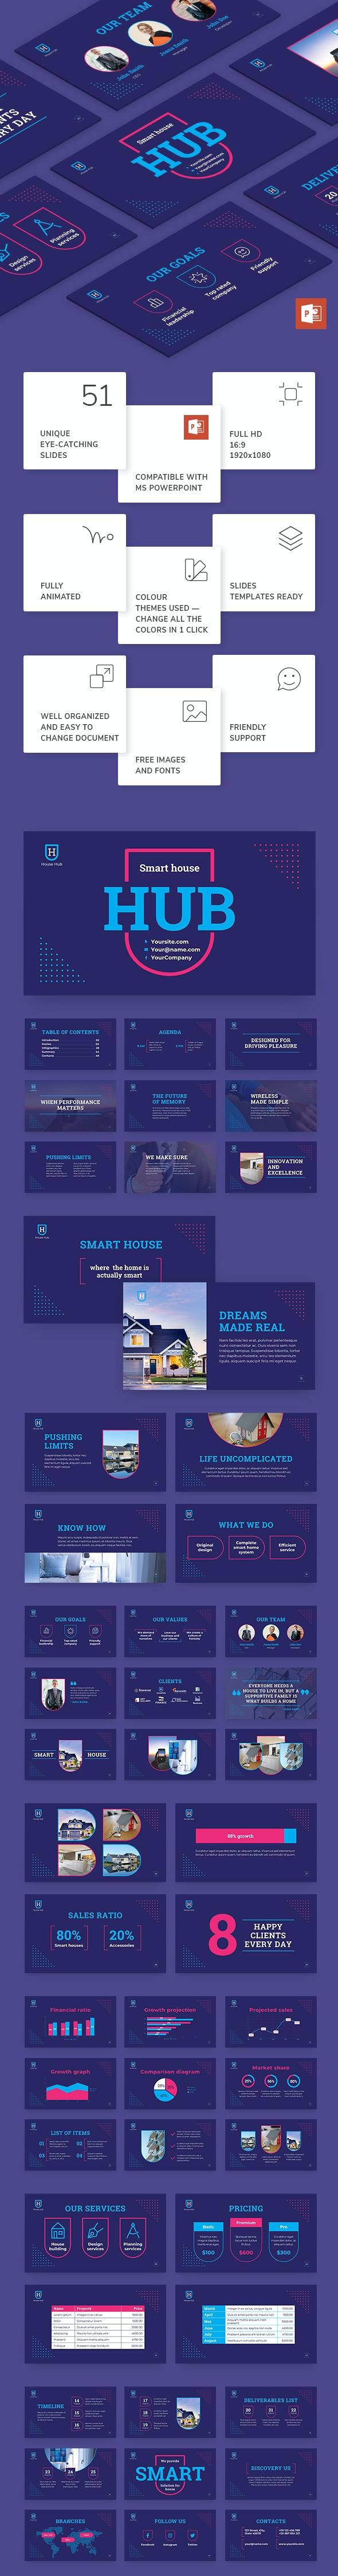 Smart House PowerPoint Presentation Template - Miscellaneous PowerPoint Templates